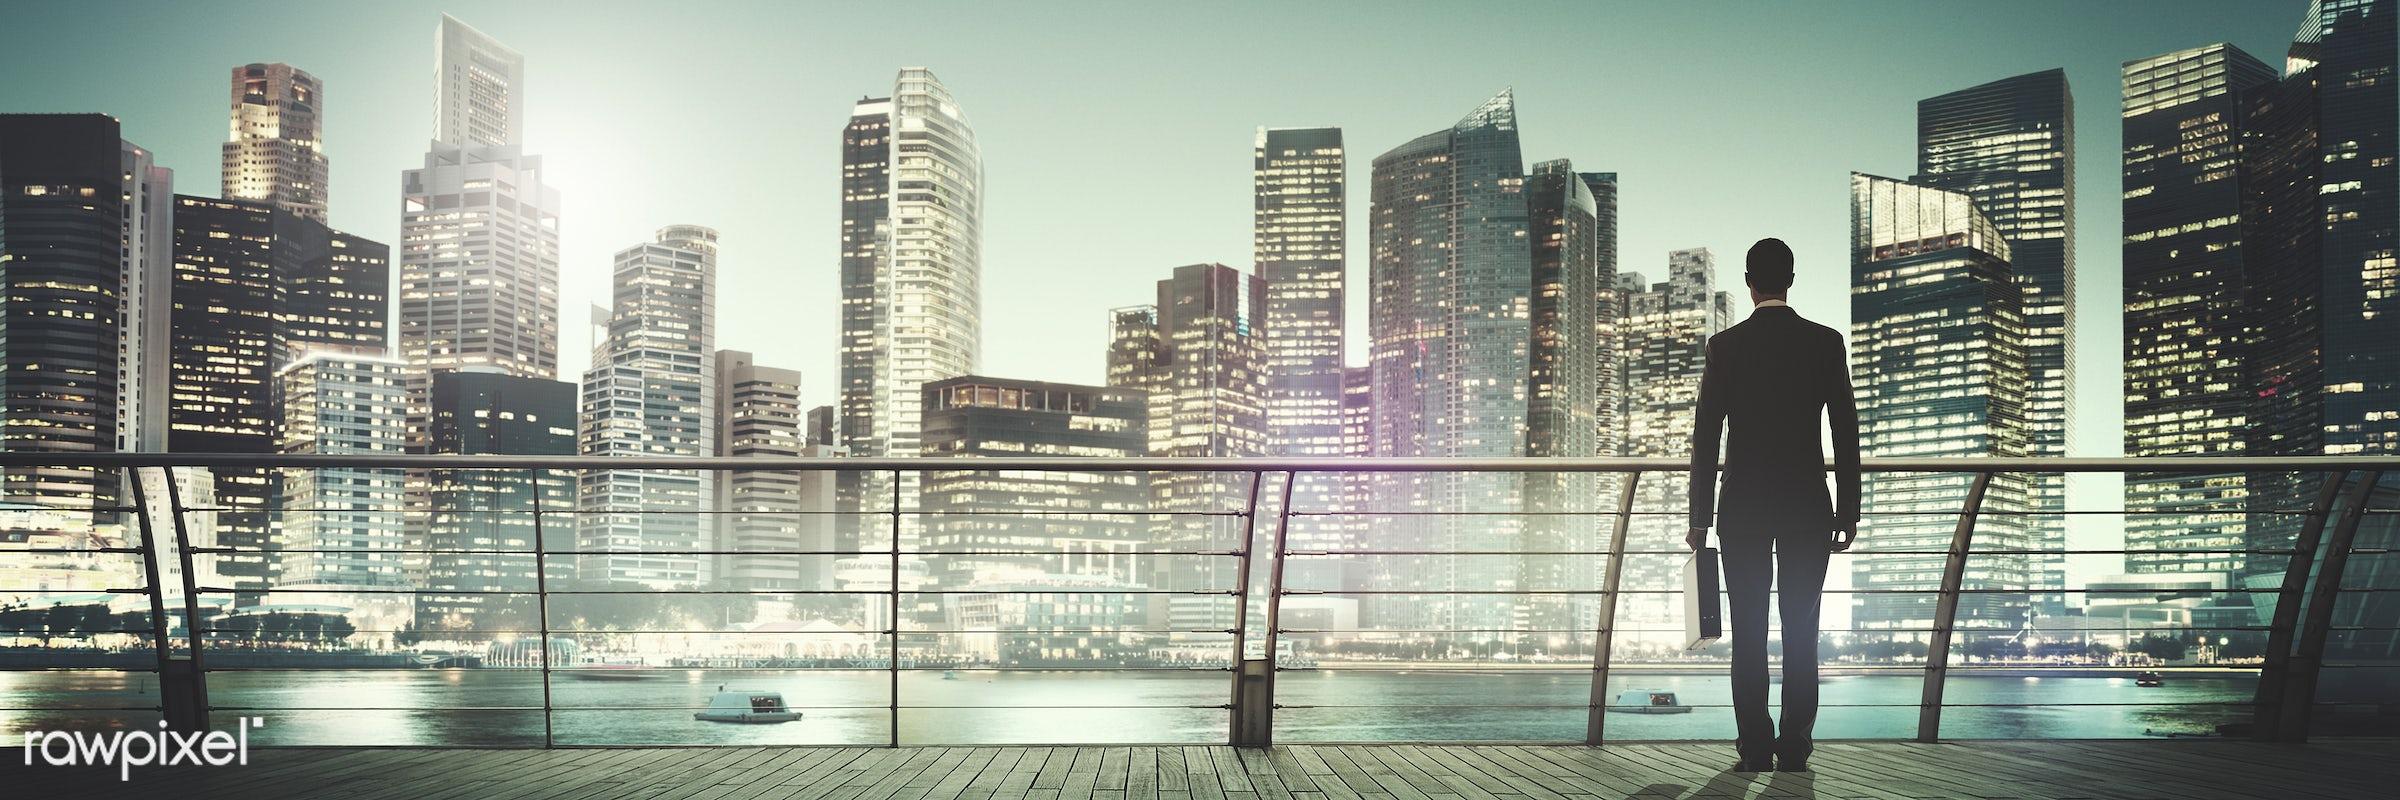 contemporary, building, business, businessman, city, city lights, cityscape, contemplation, corporate, harbour, looking, man...